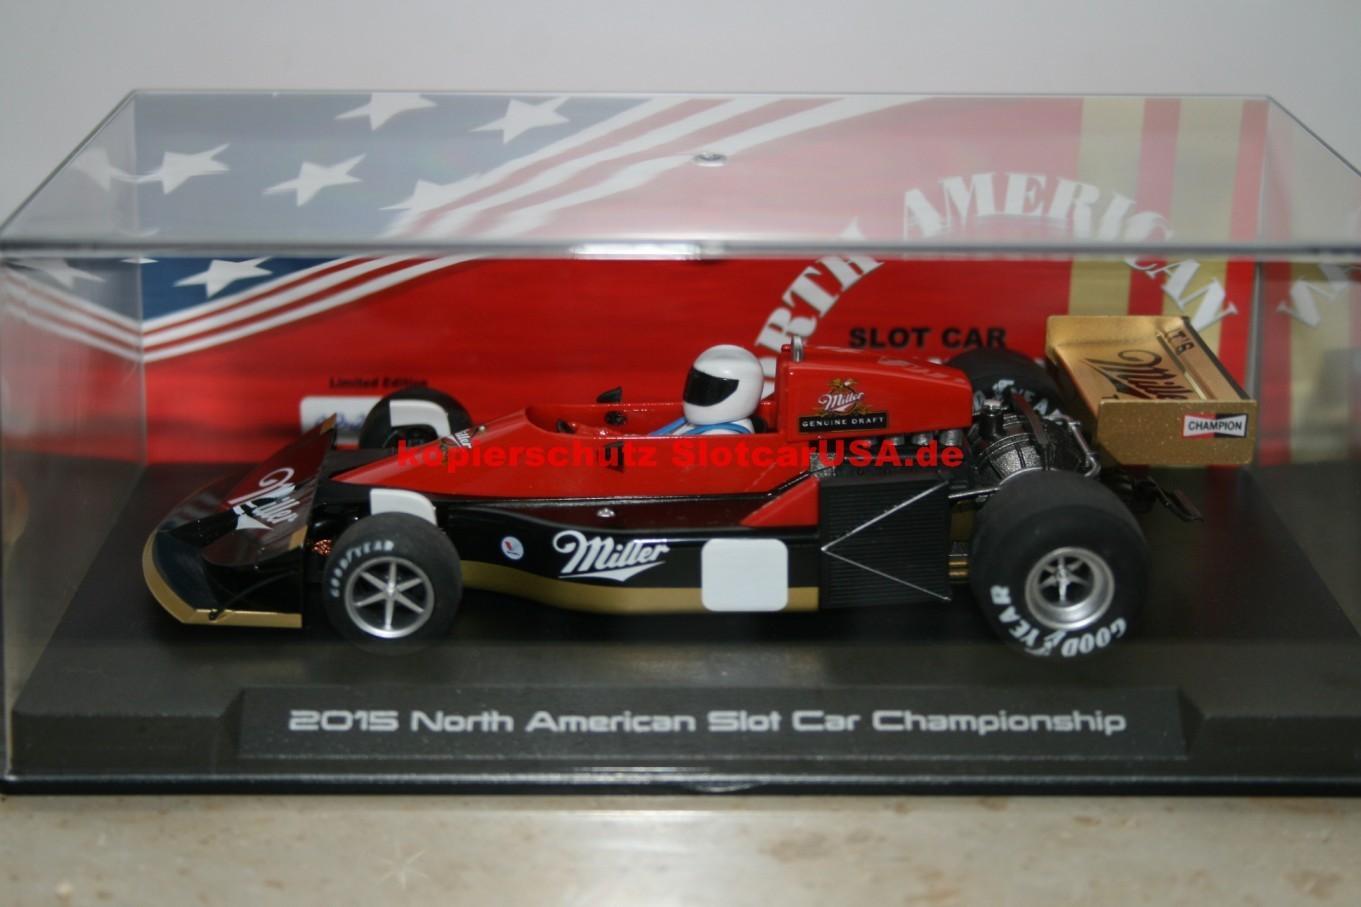 World slot car racing championship / Double down slots and poker